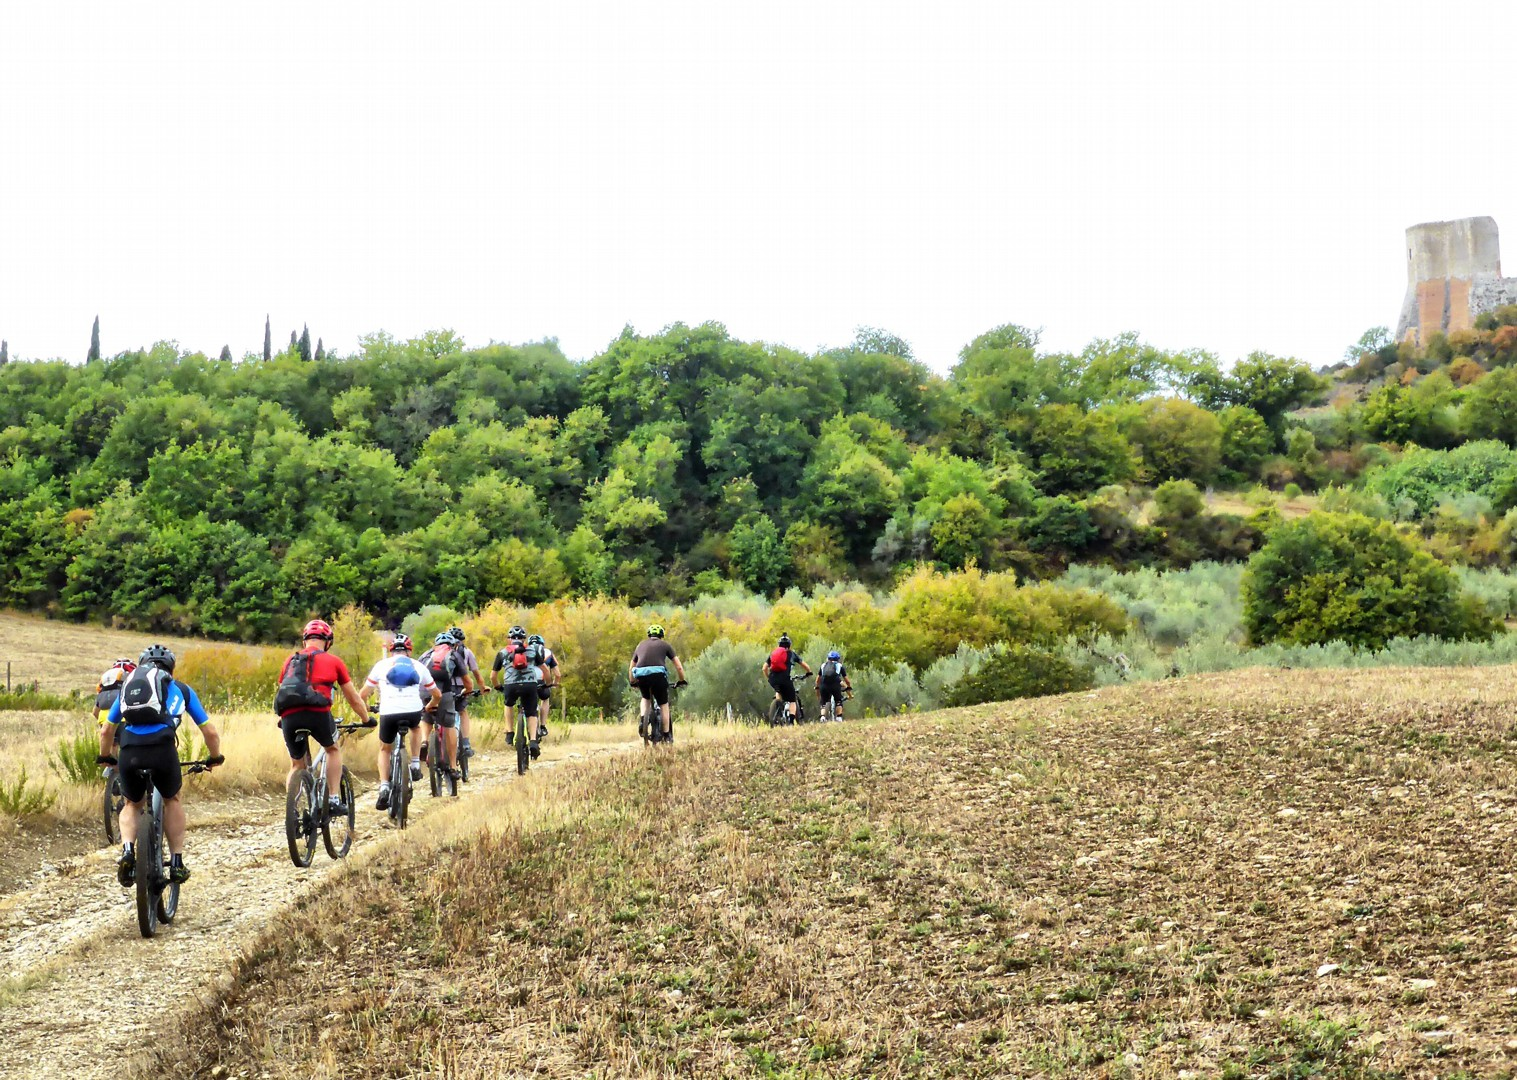 Foto 11-09-17, 12 17 15.jpg - Italy - Via Francigena (Tuscany to Rome) - Guided Mountain Biking Holiday - Mountain Biking